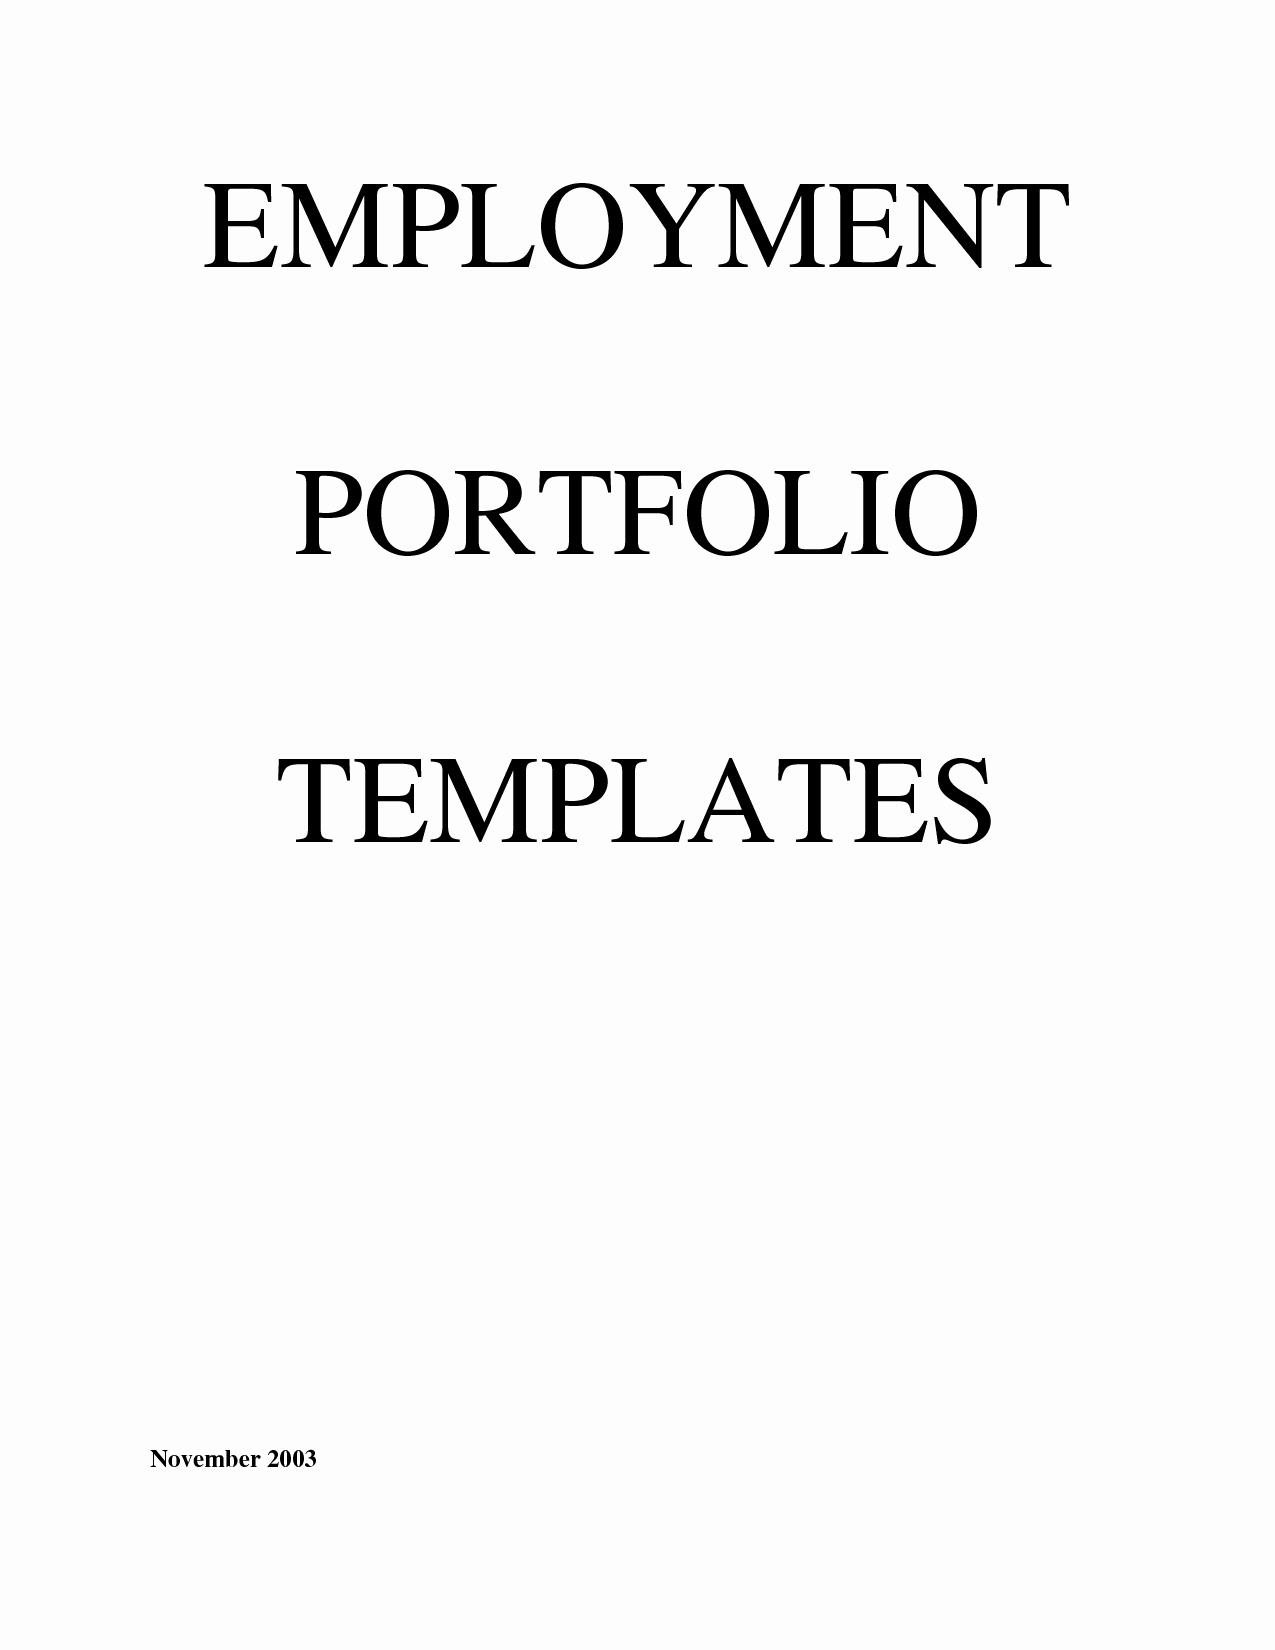 Portfolio Cover Page Template Elegant Best S Of Portfolio Cover Page Template Career